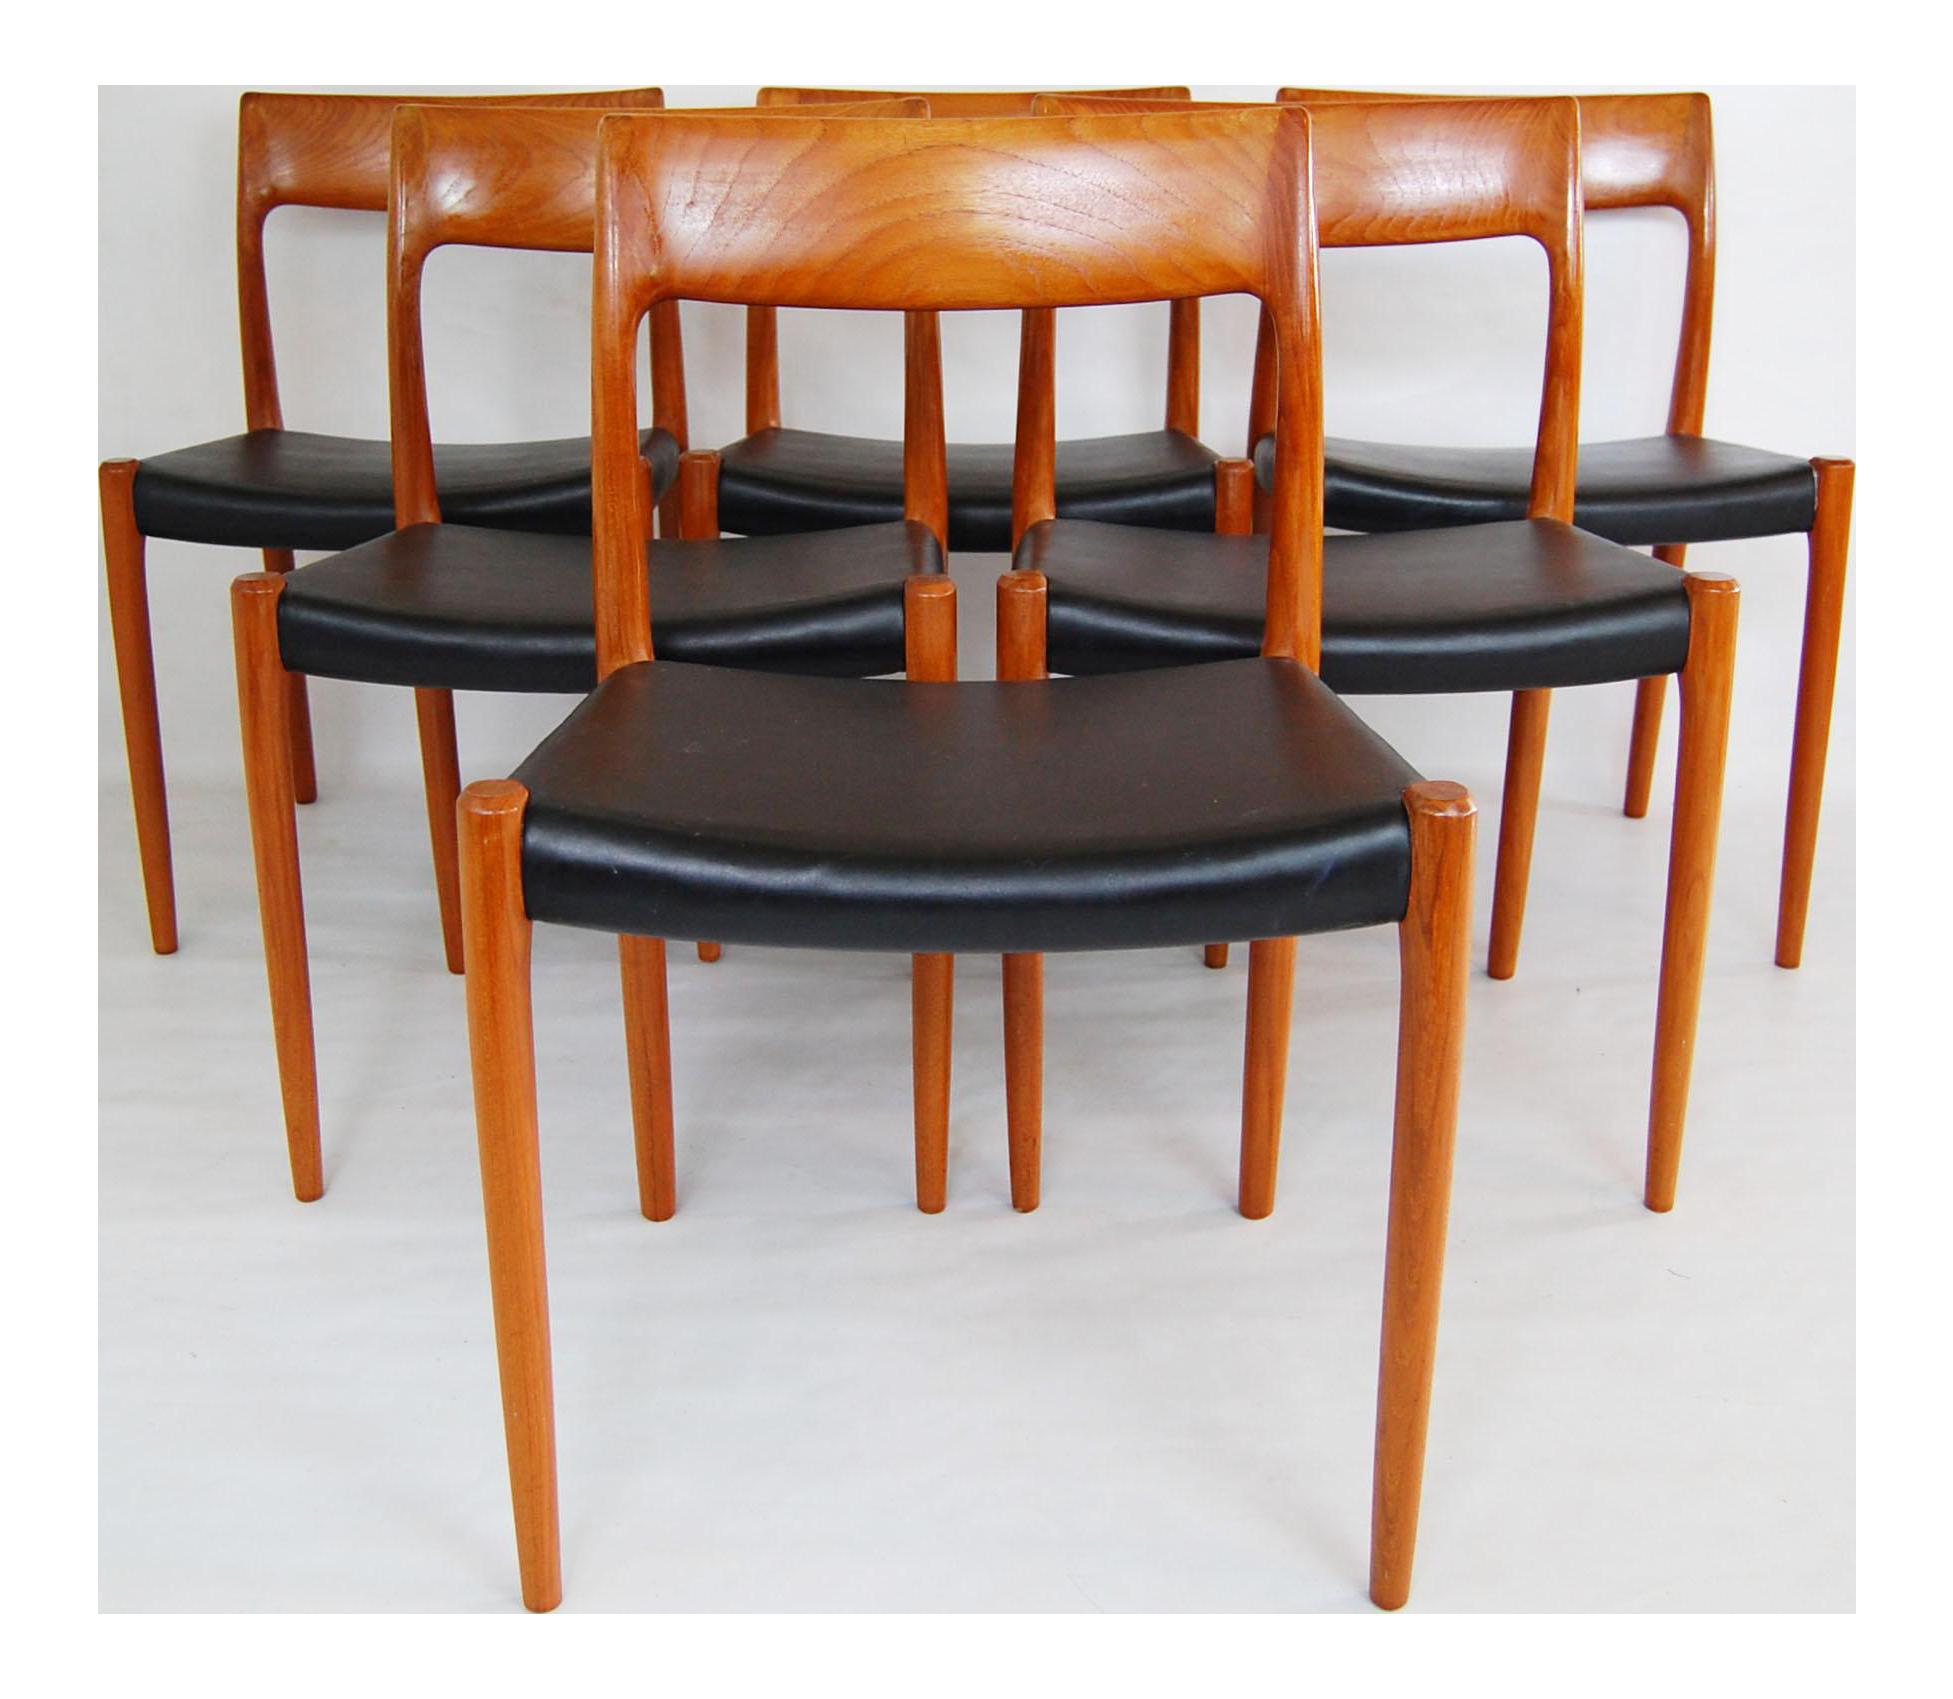 Vintage Moller Dining Chairs ~ Danish modern j l moller model teak dining chairs set